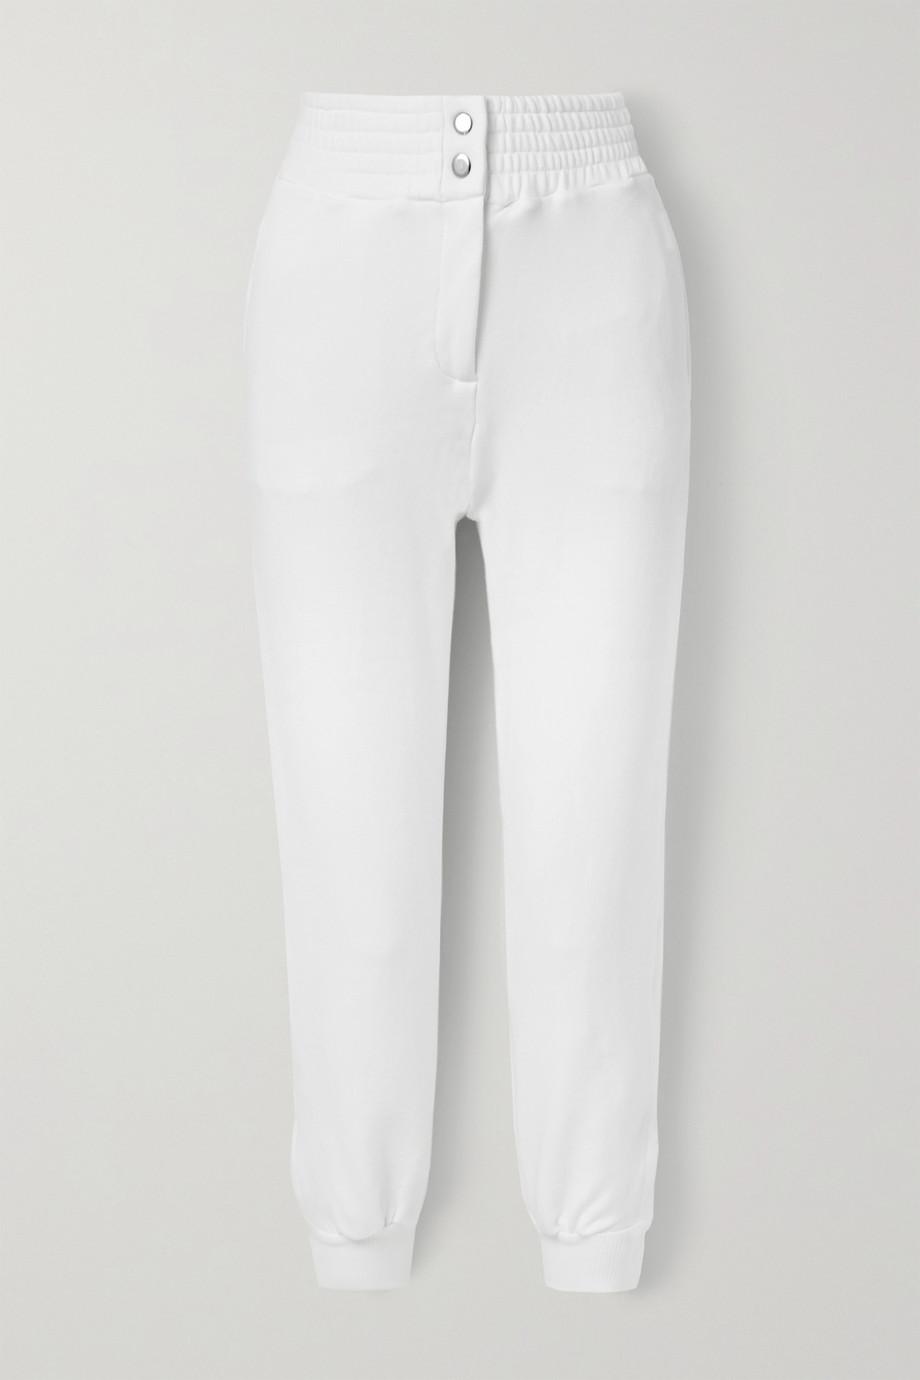 The Range Element 弹力法国棉质平纹布休闲裤